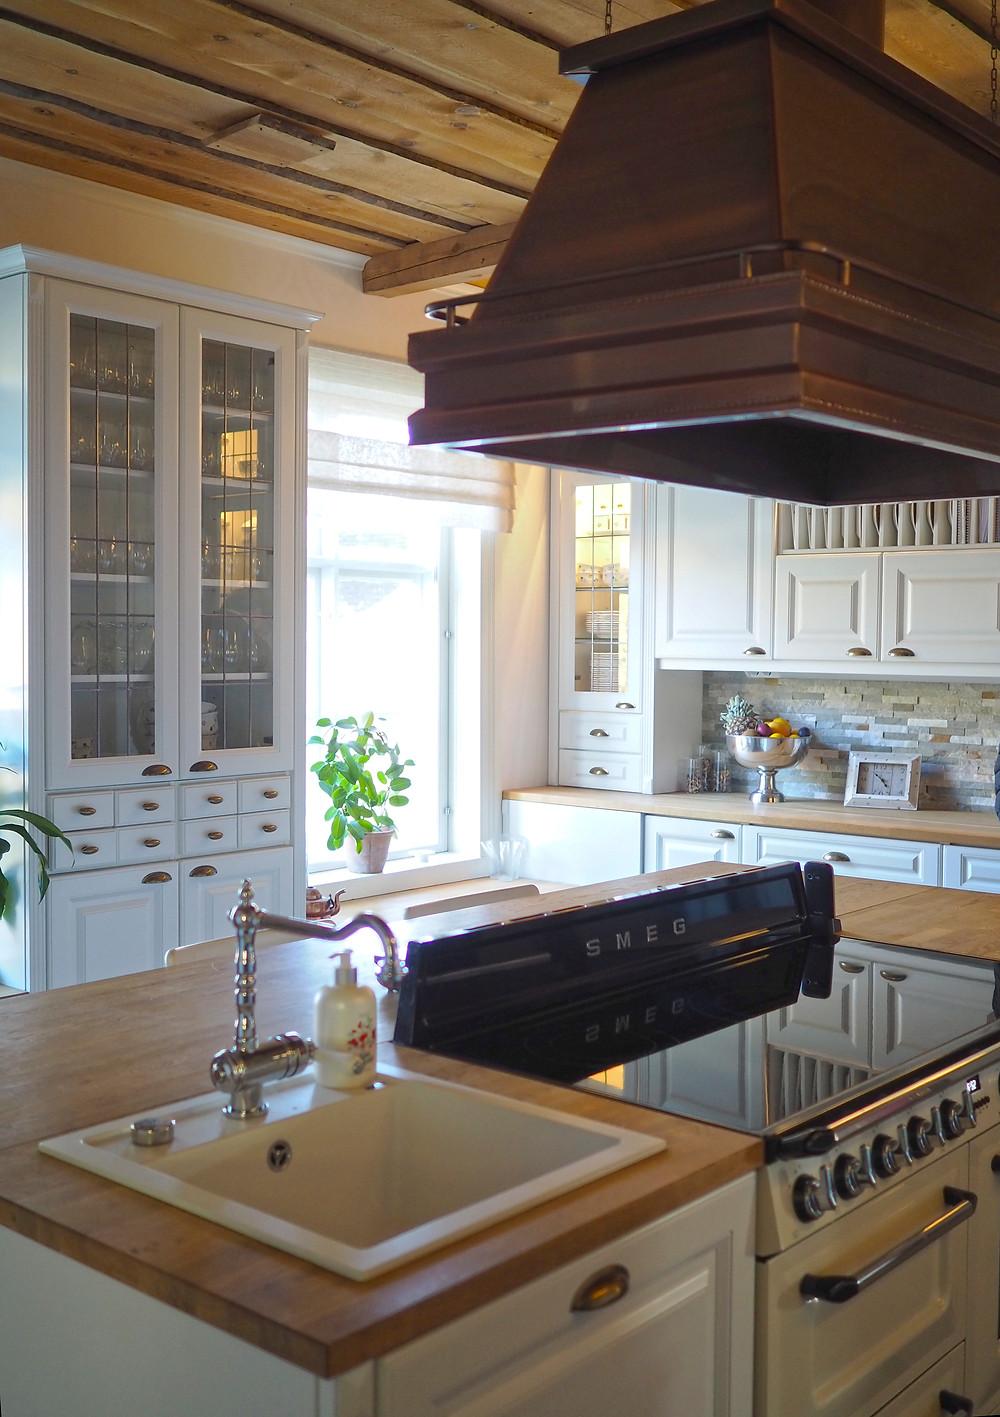 Marjoniementila keittiö